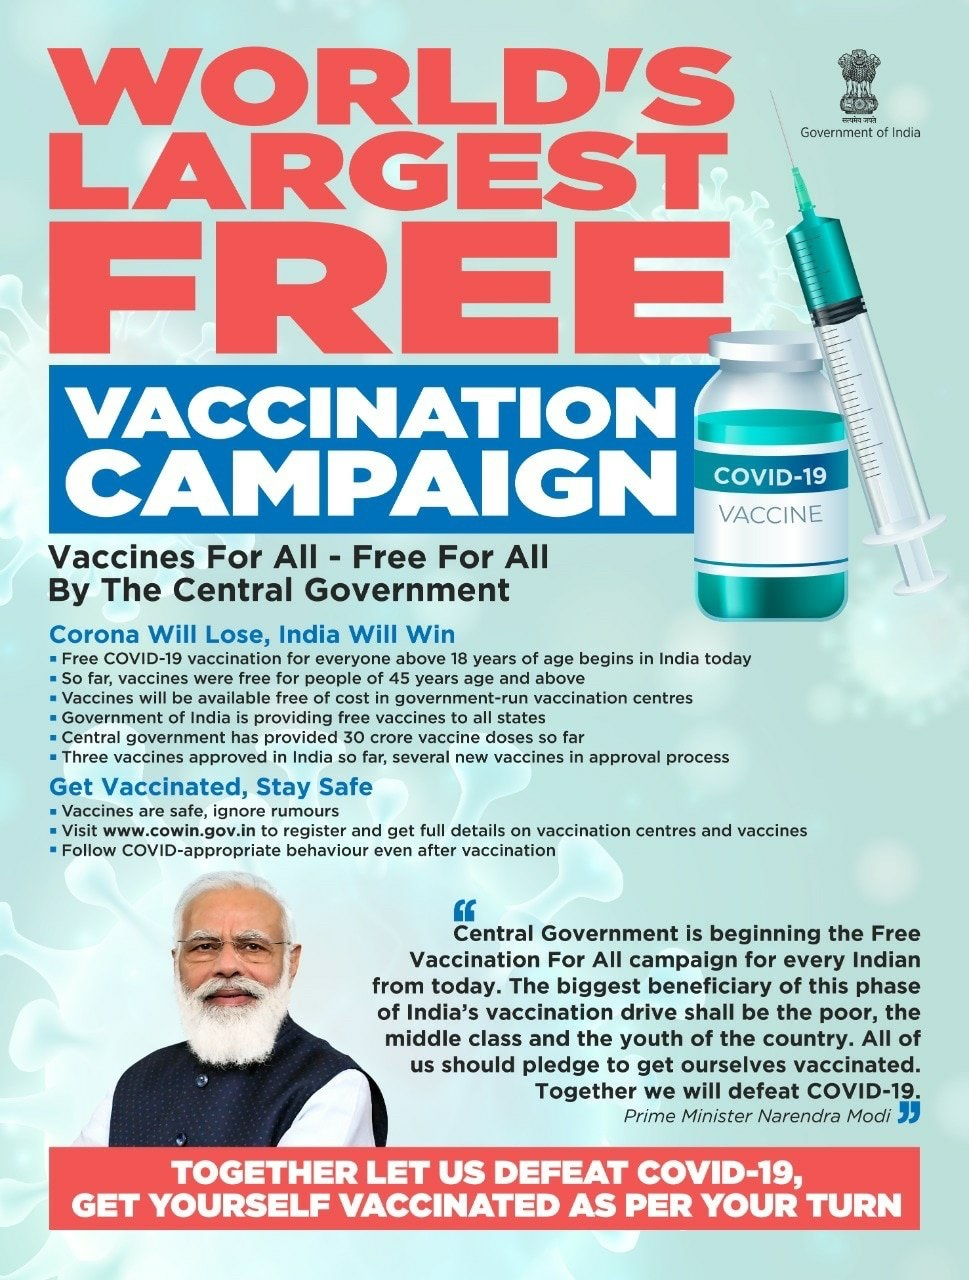 Free Vaccination - 8 million